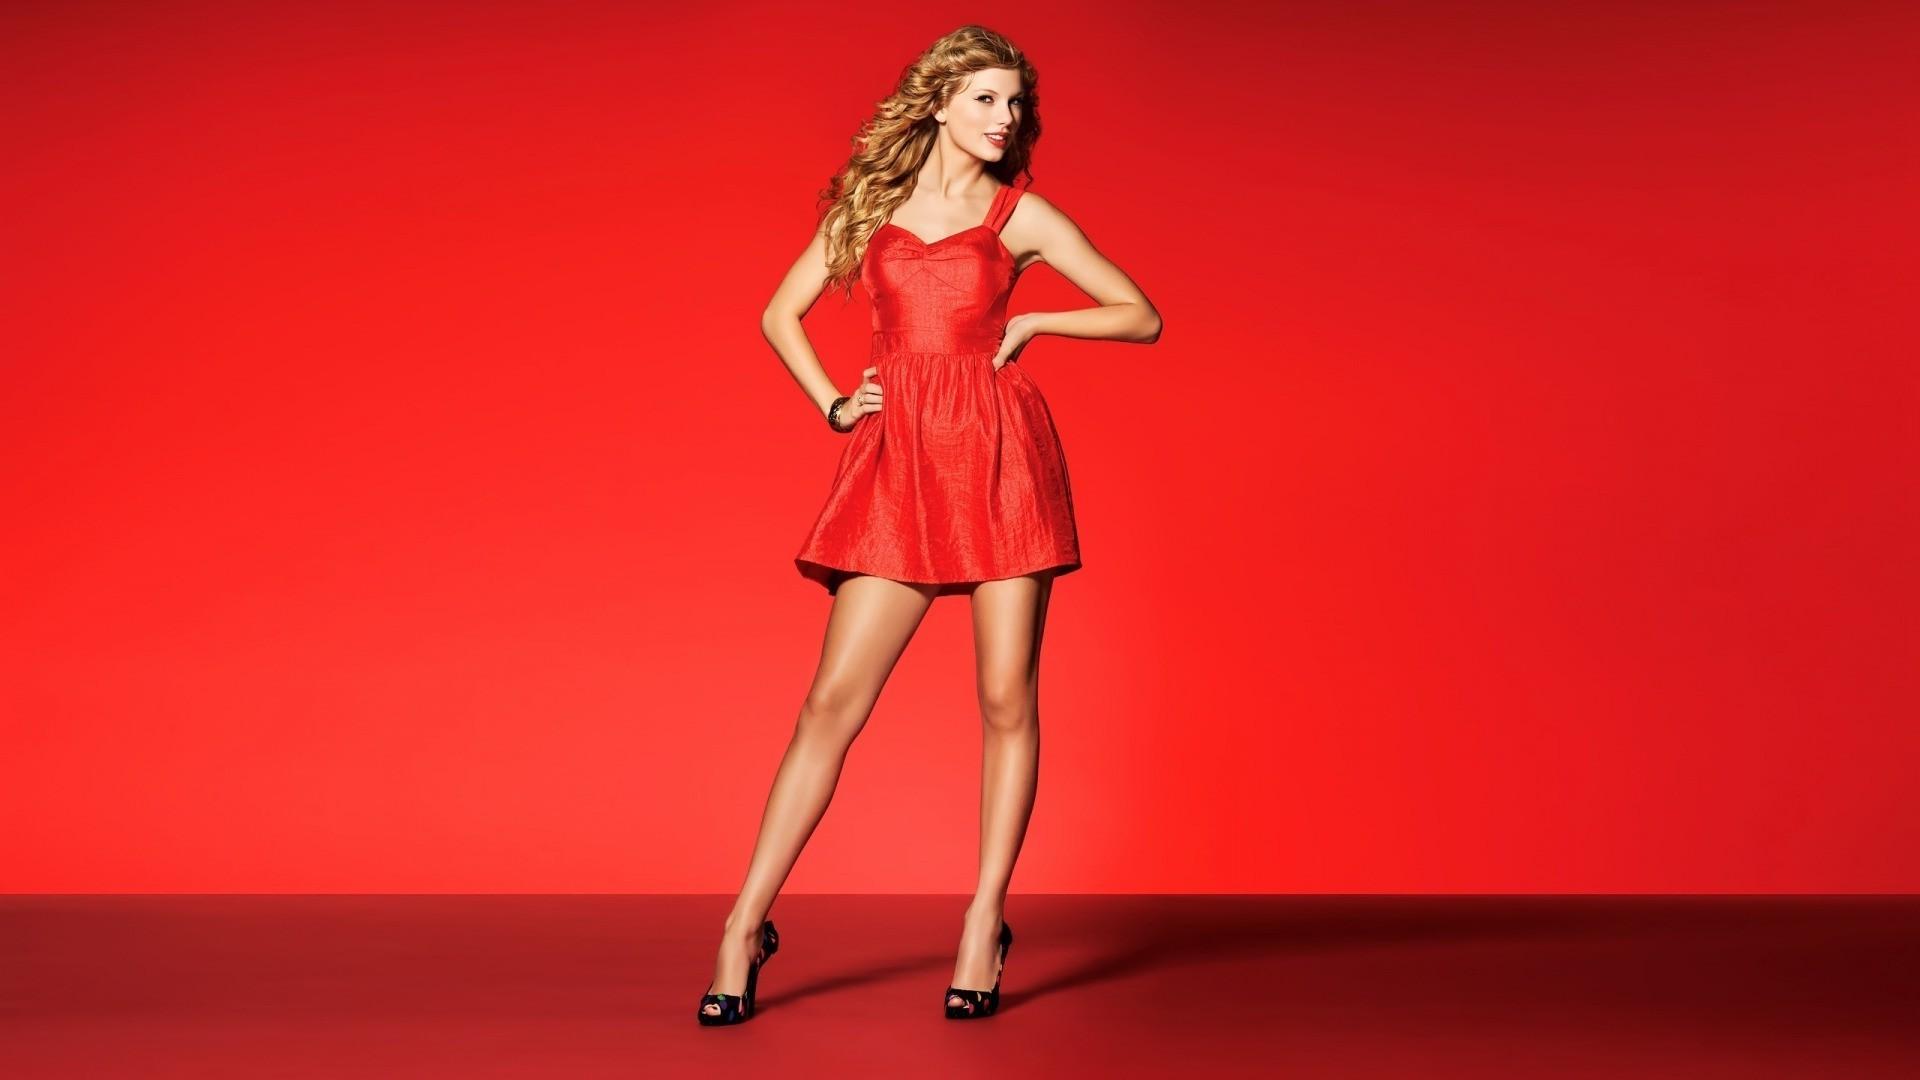 Hintergrundbilder : Frau, Modell-, blond, rot, Berühmtheit, Kleid ...